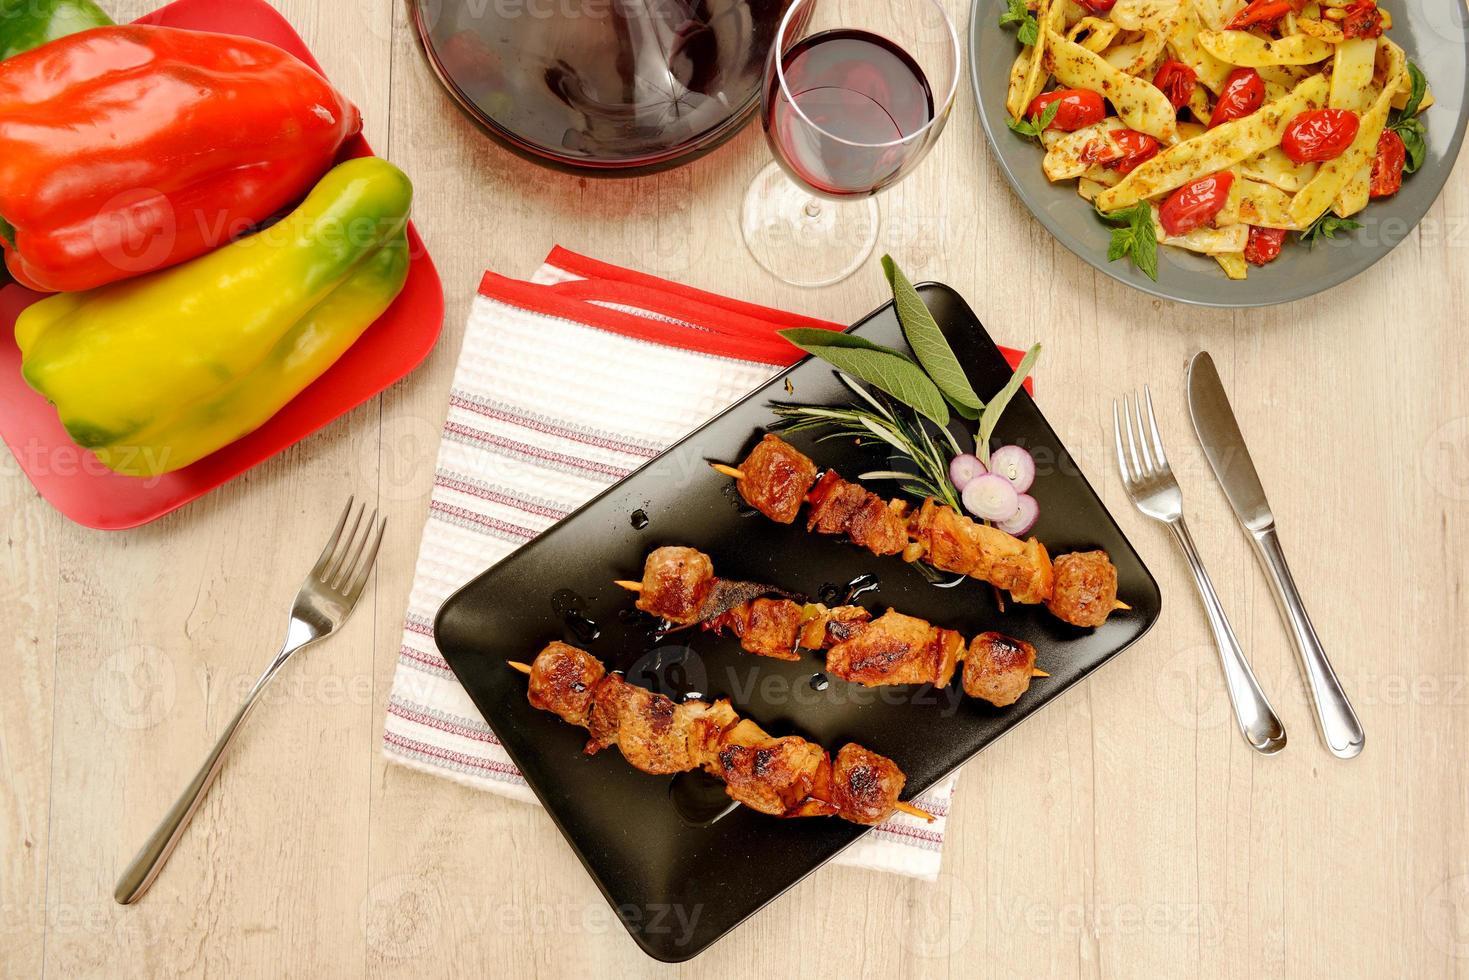 spiesen vlees, kant-en-klaar gekookt foto